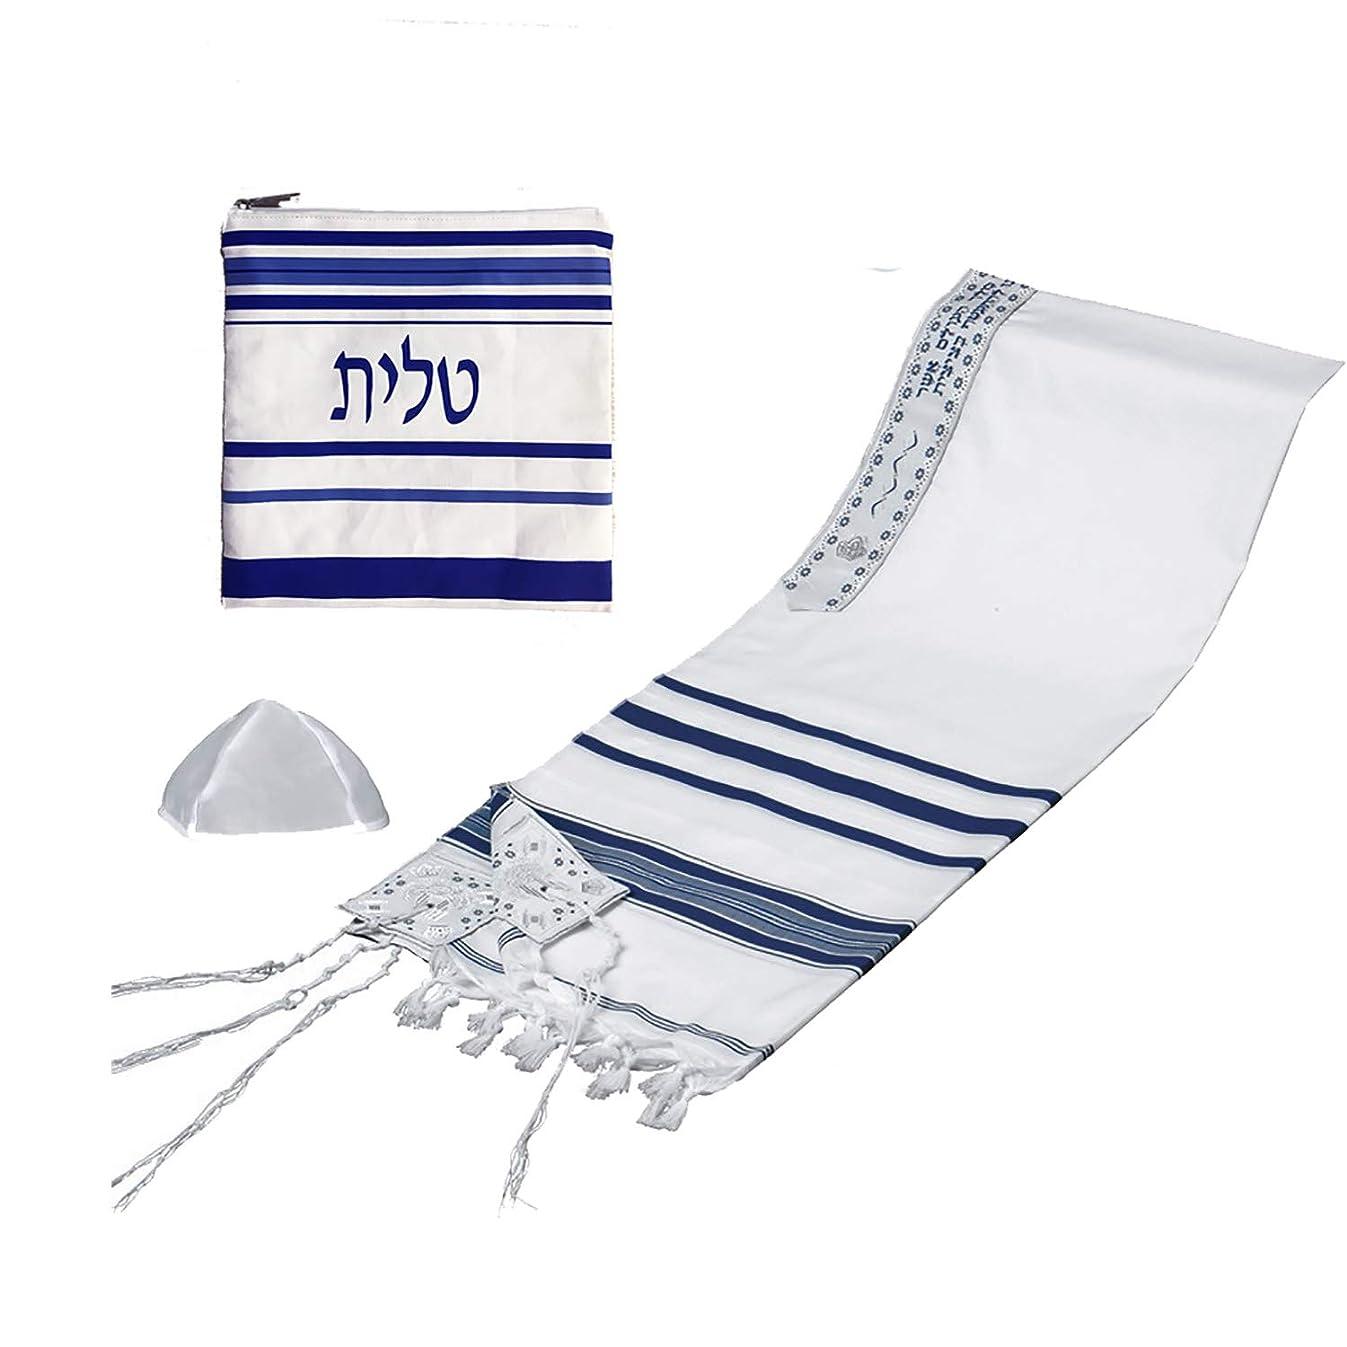 Judaica Unlimited Acrylic Tallit (Imitation Wool) Blue Tallit Bag & Kippah Size 18